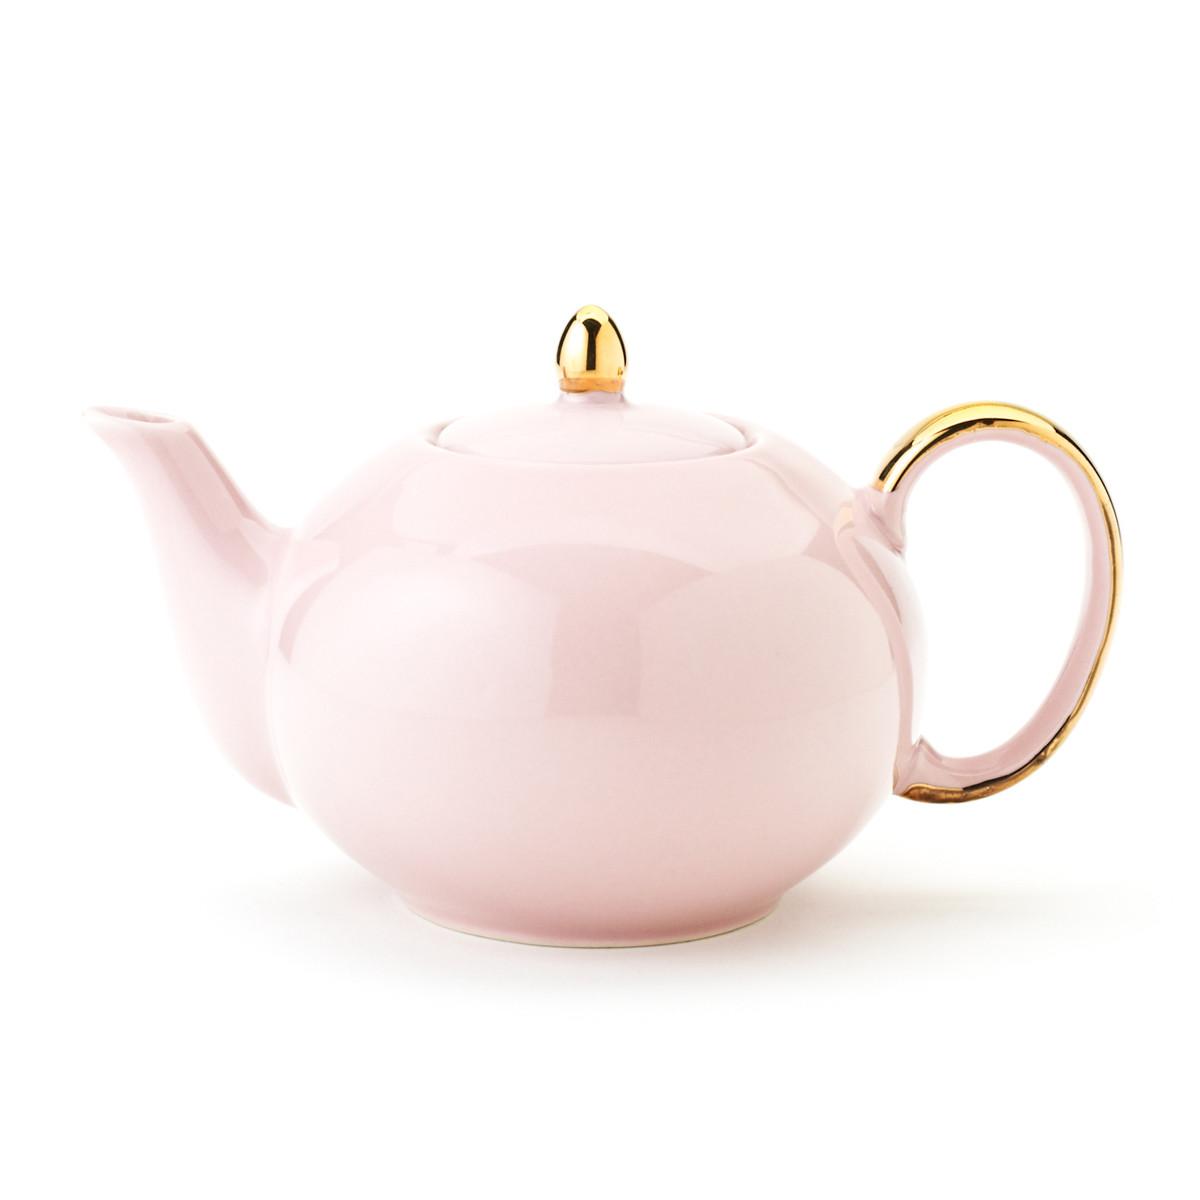 Teapot clipart hot Kitchenaid of Teapot Otley Tea